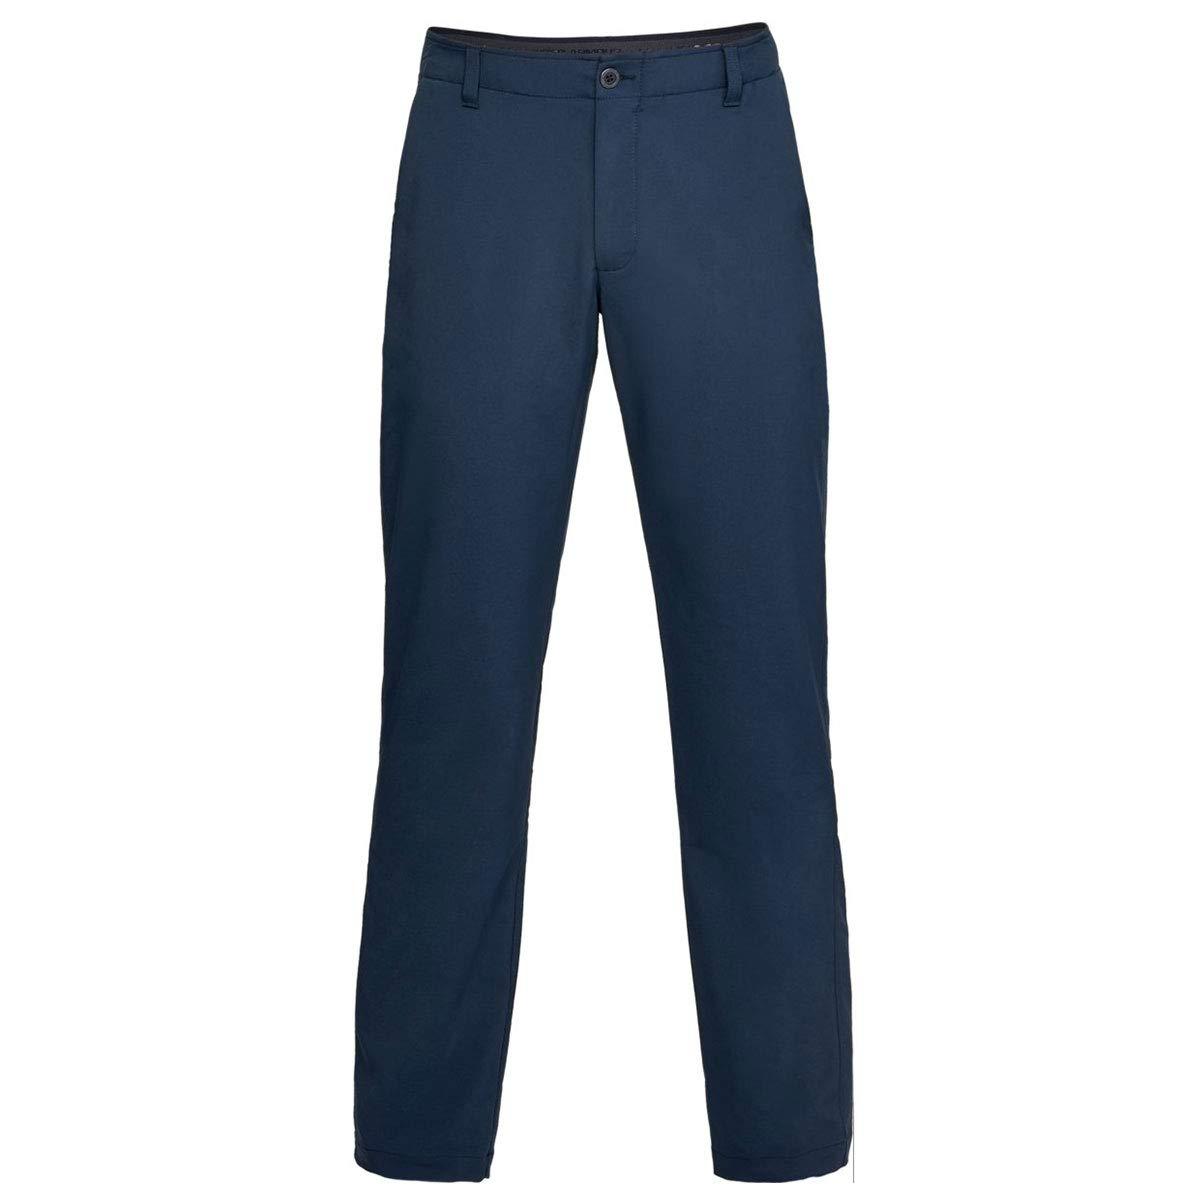 Under Armour Hommes 2019 EU Performance Effilage Pantalon